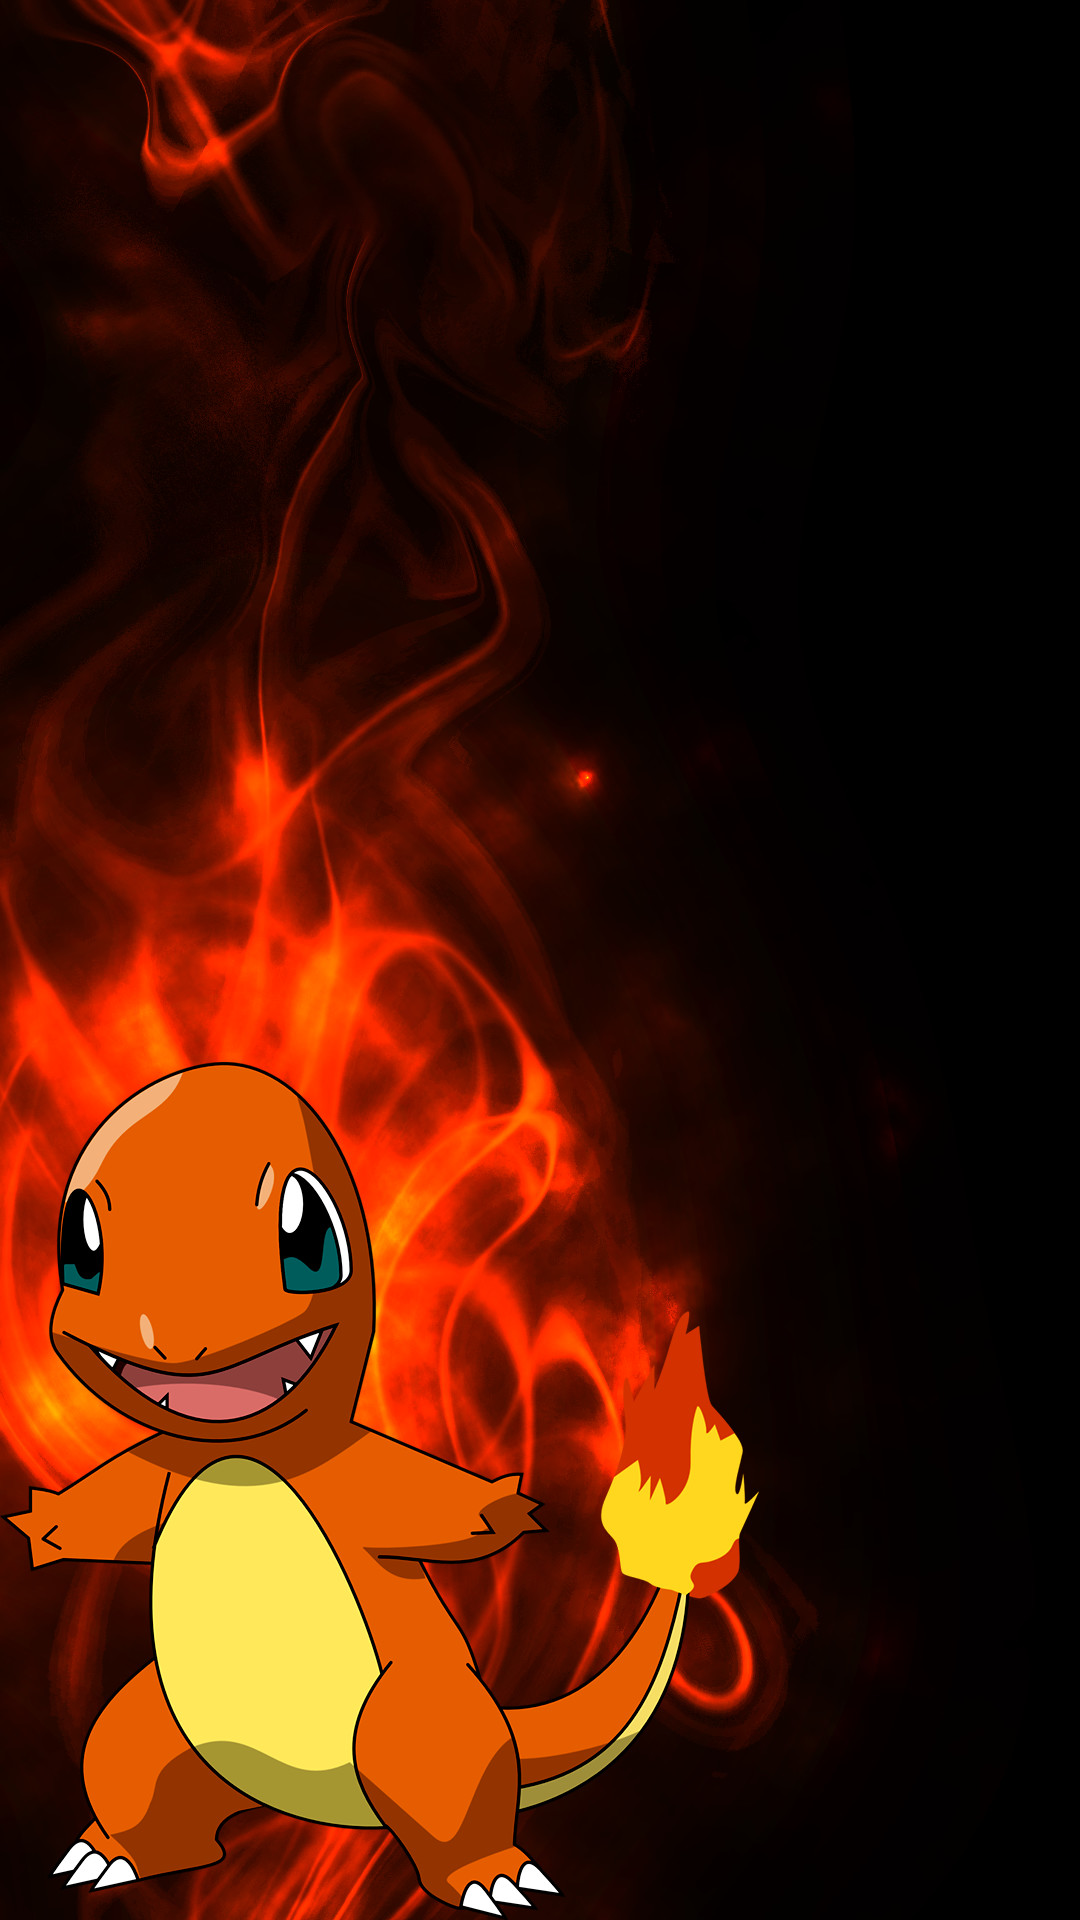 1080x1920 Pokemon Wallpaper Wallpapers Background Backgrounds Anime Charmander